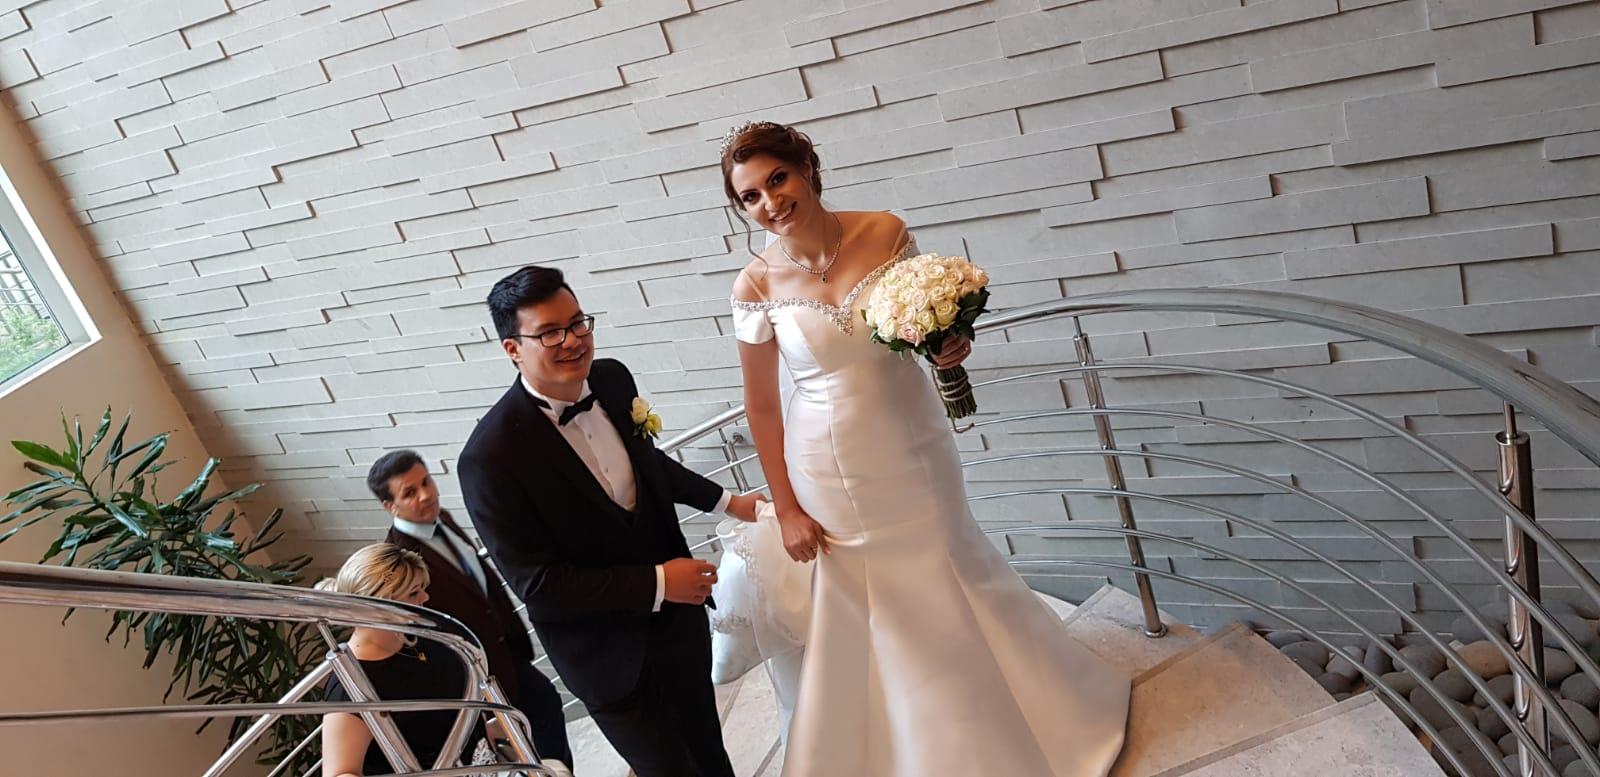 İranian Wedding Planner in Turkey